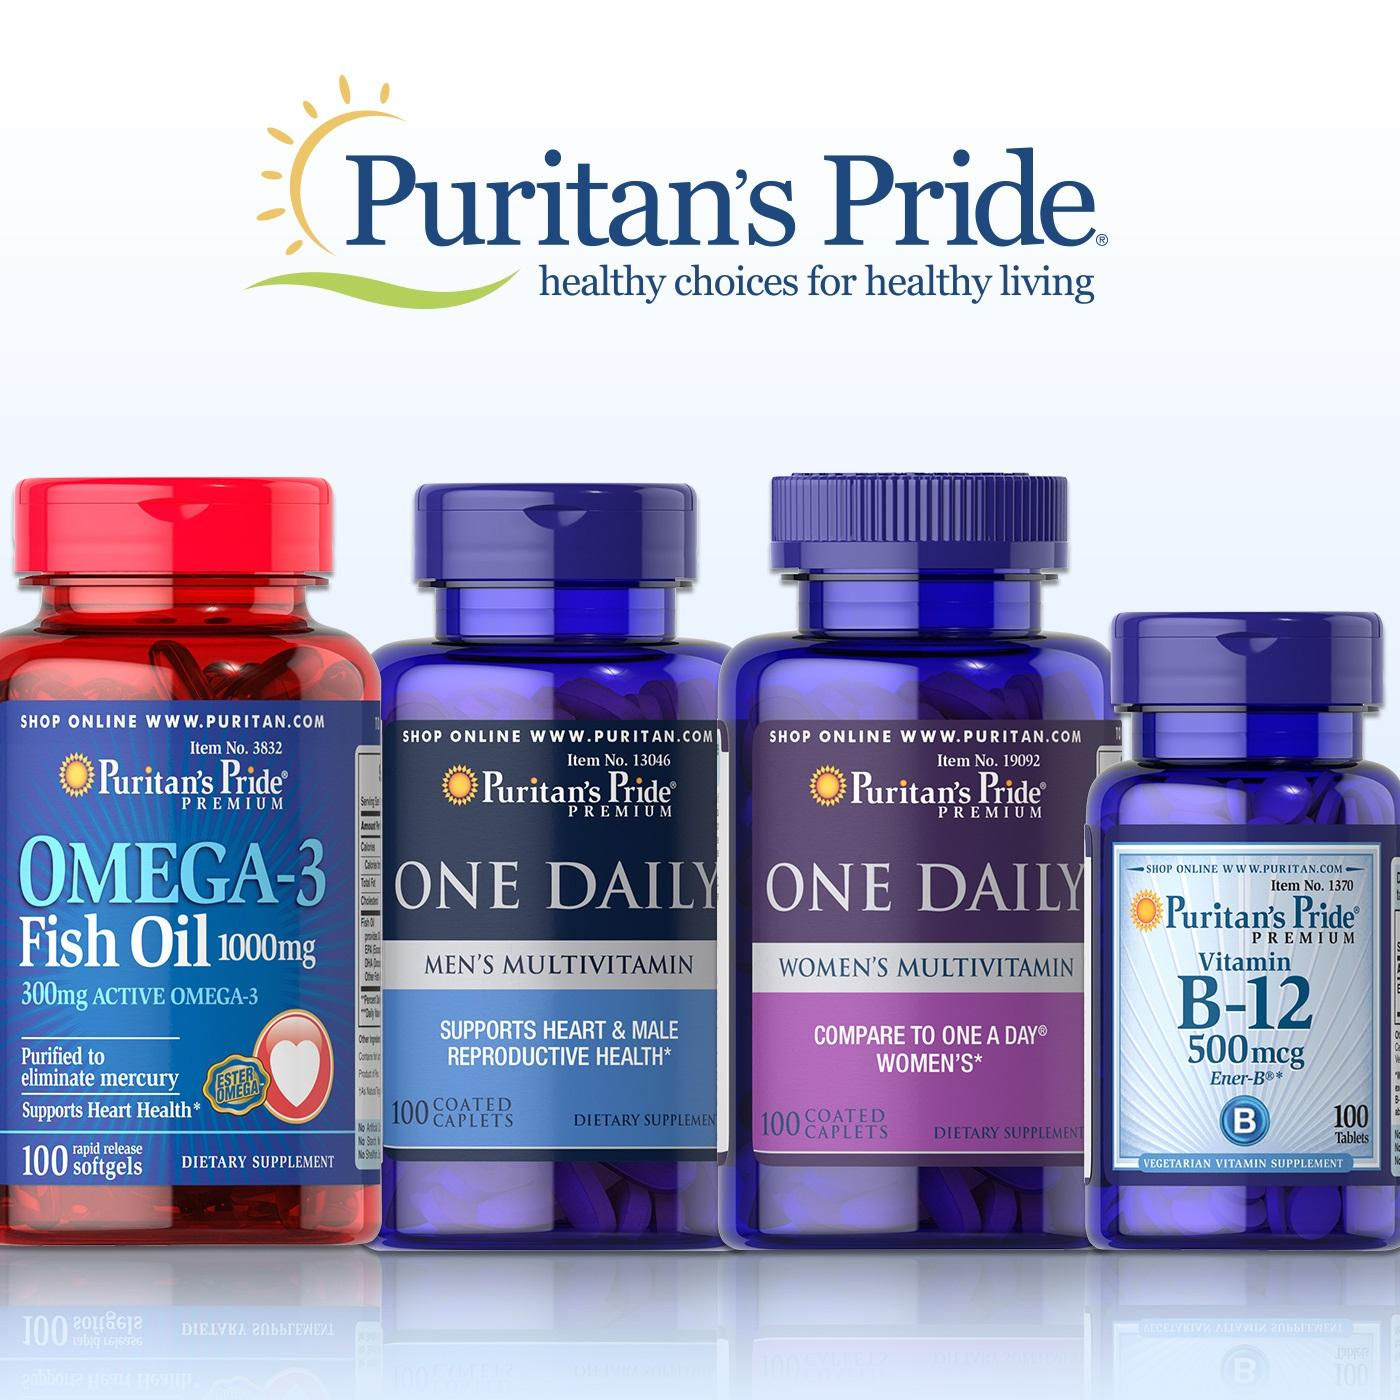 Puritan's Pride 普丽普莱:全场自营商品